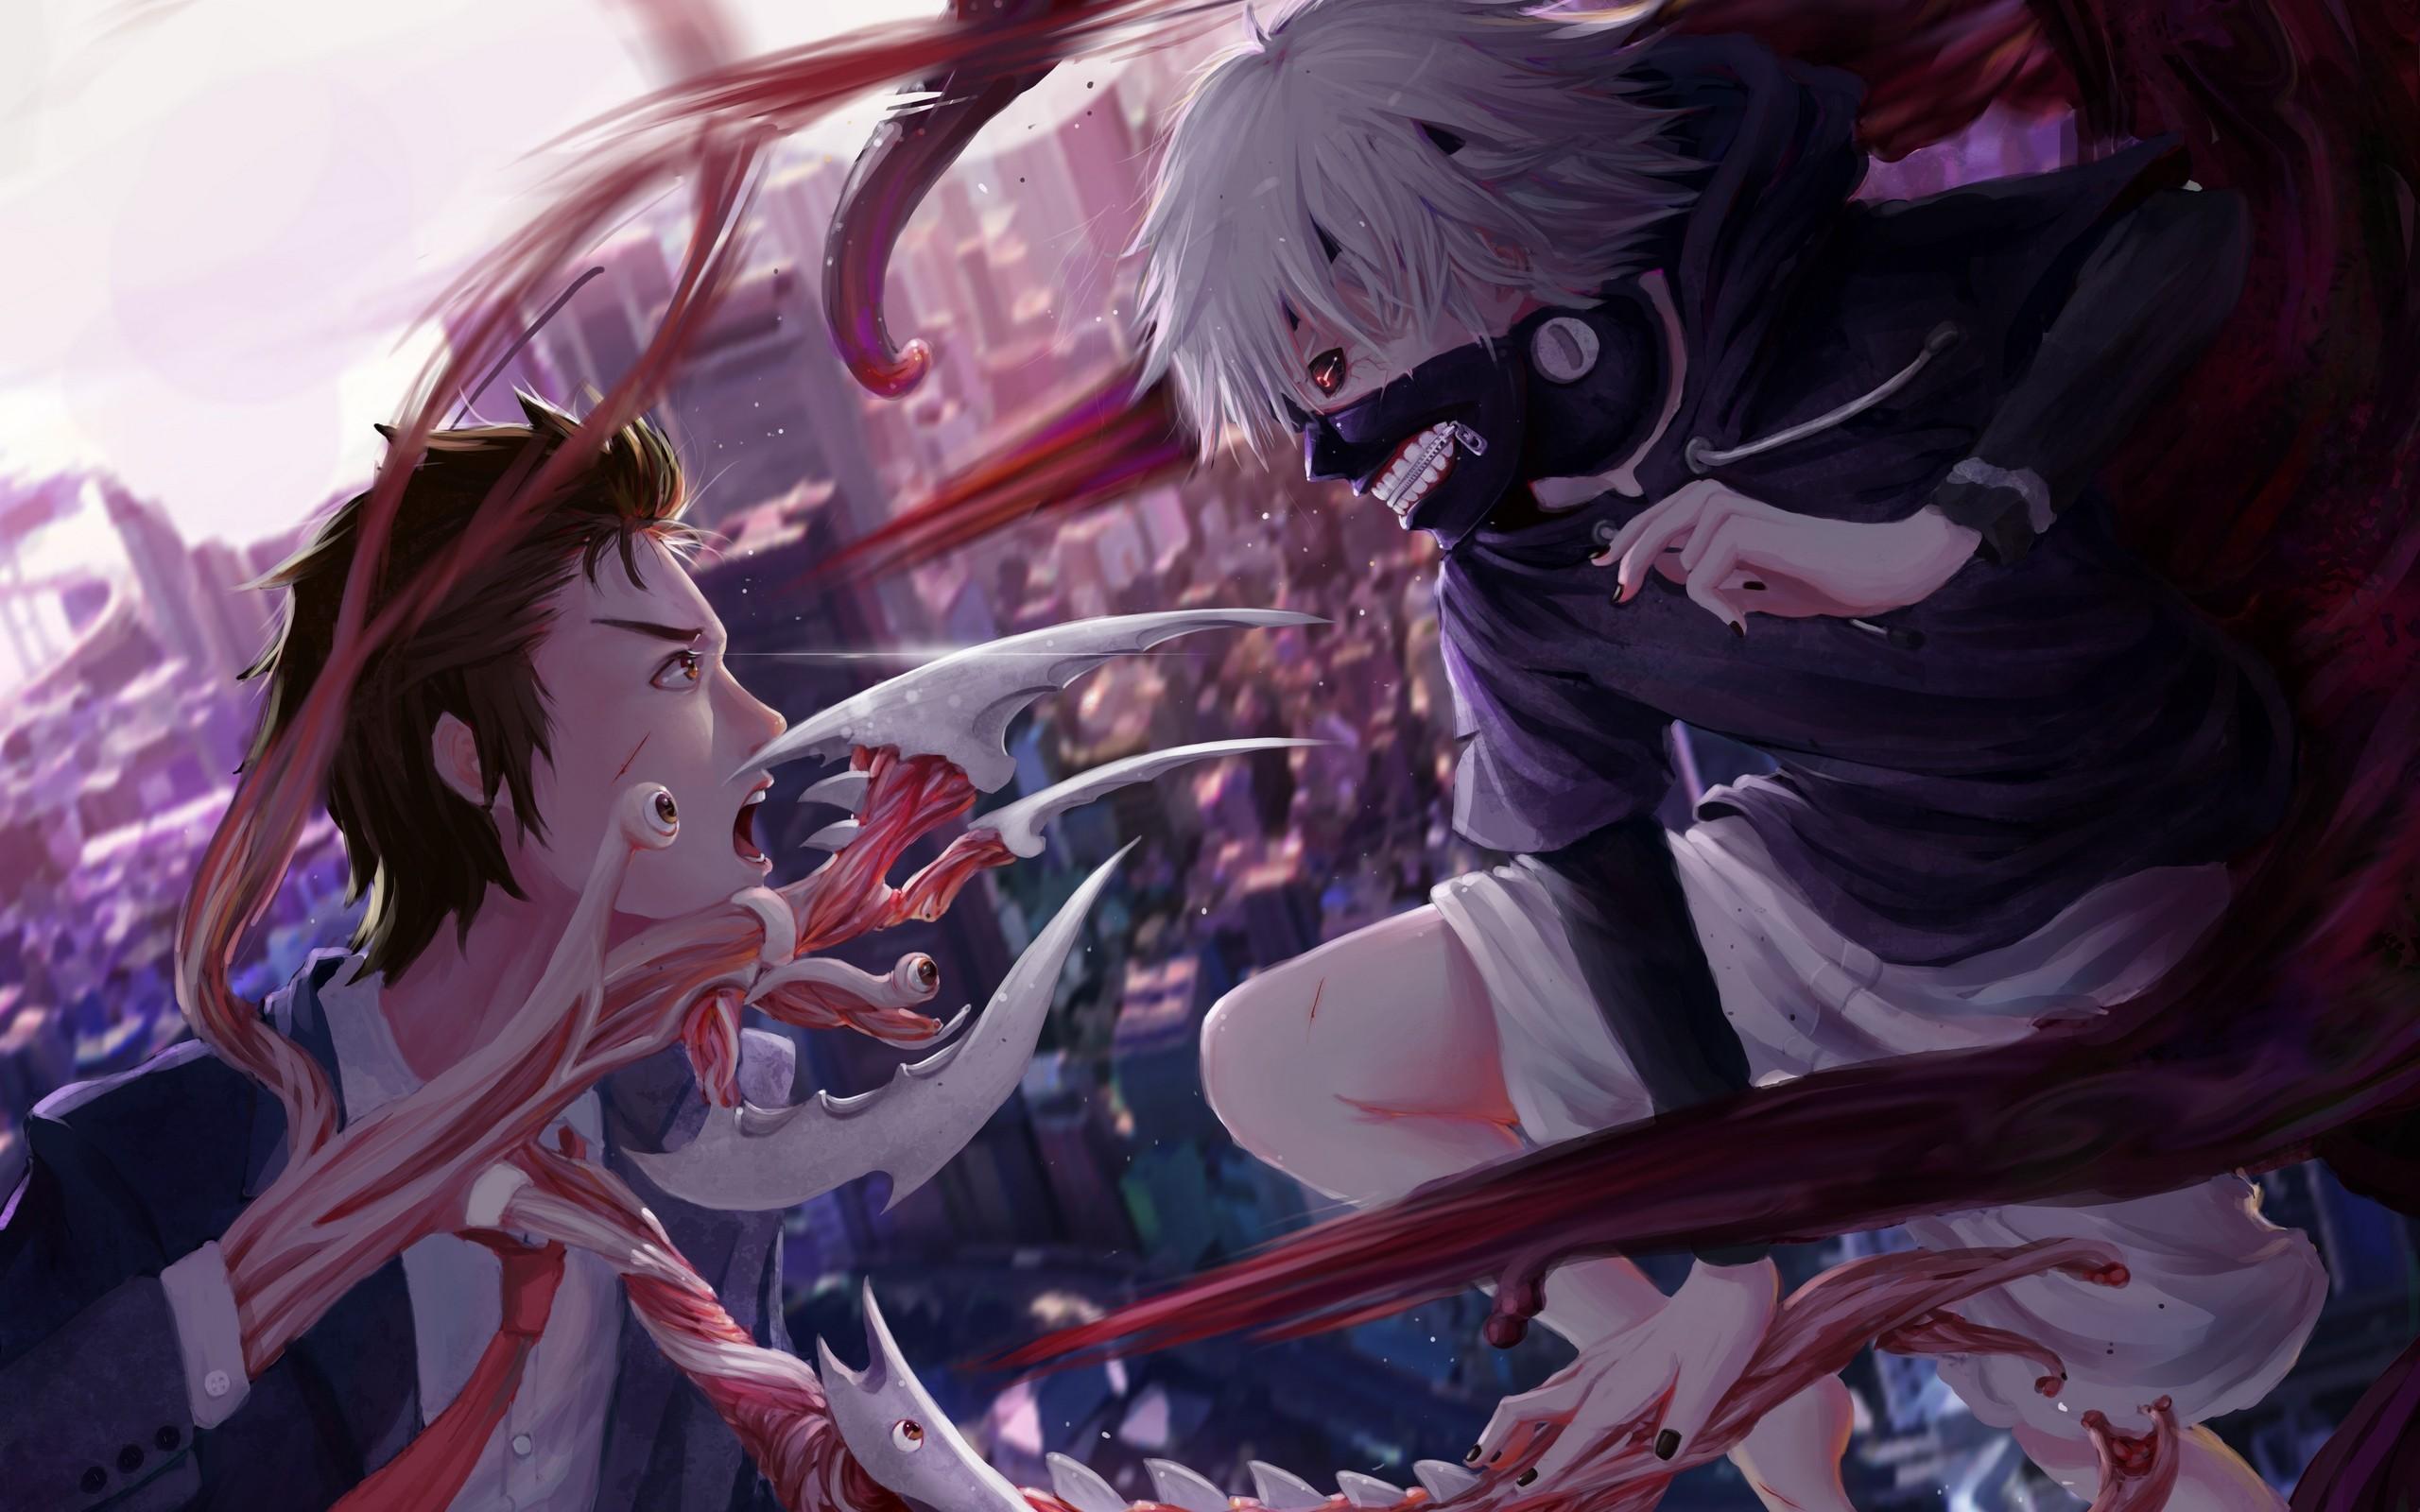 fond d'ecran anime tokyo ghoul